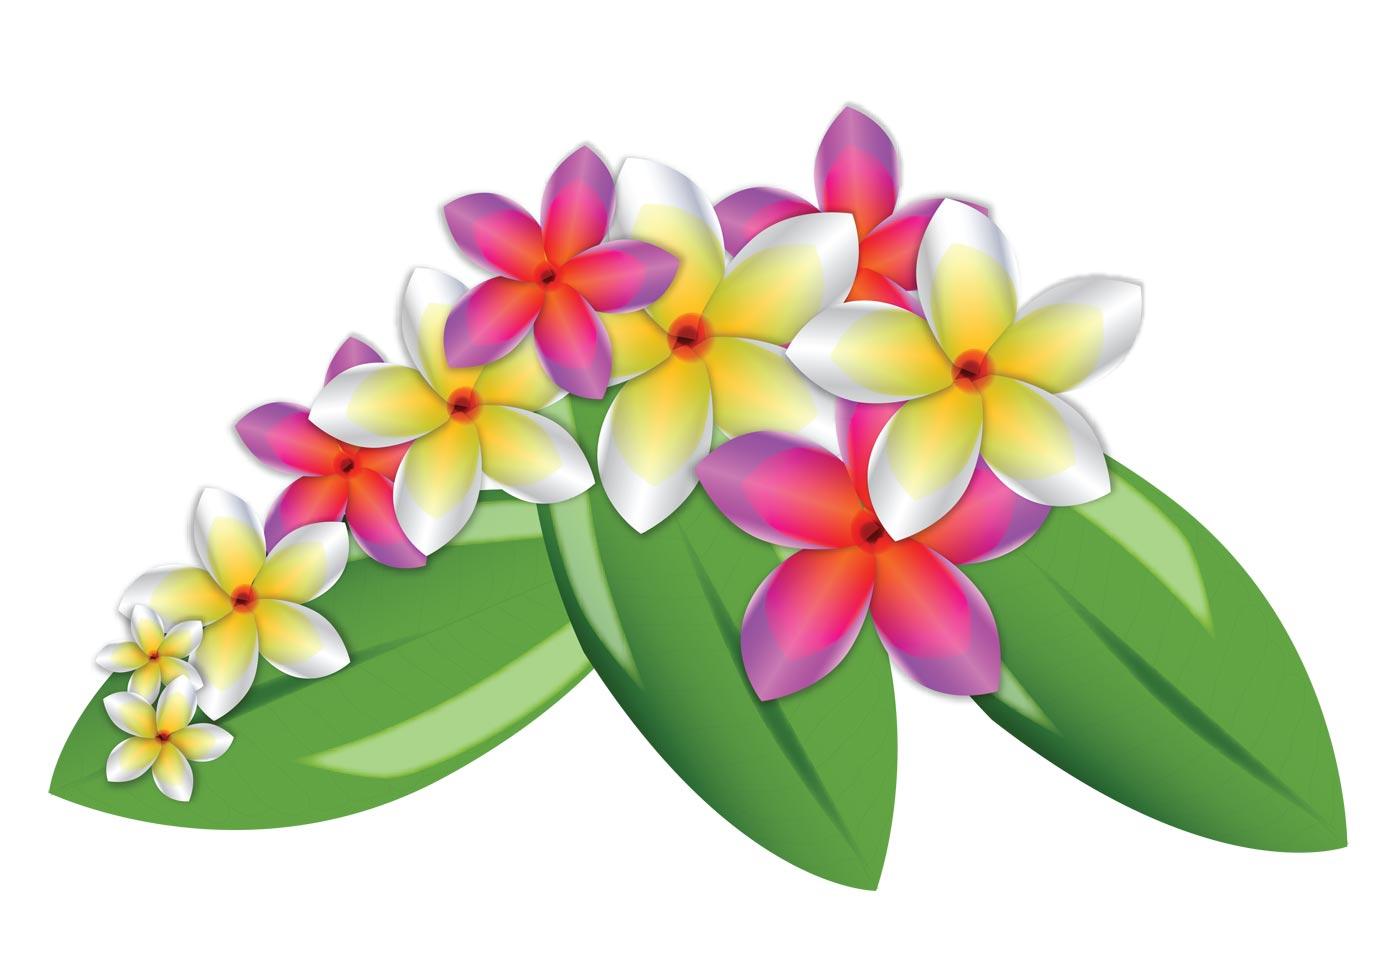 Plumeria Flowers Png Plumeria Vector Flowers